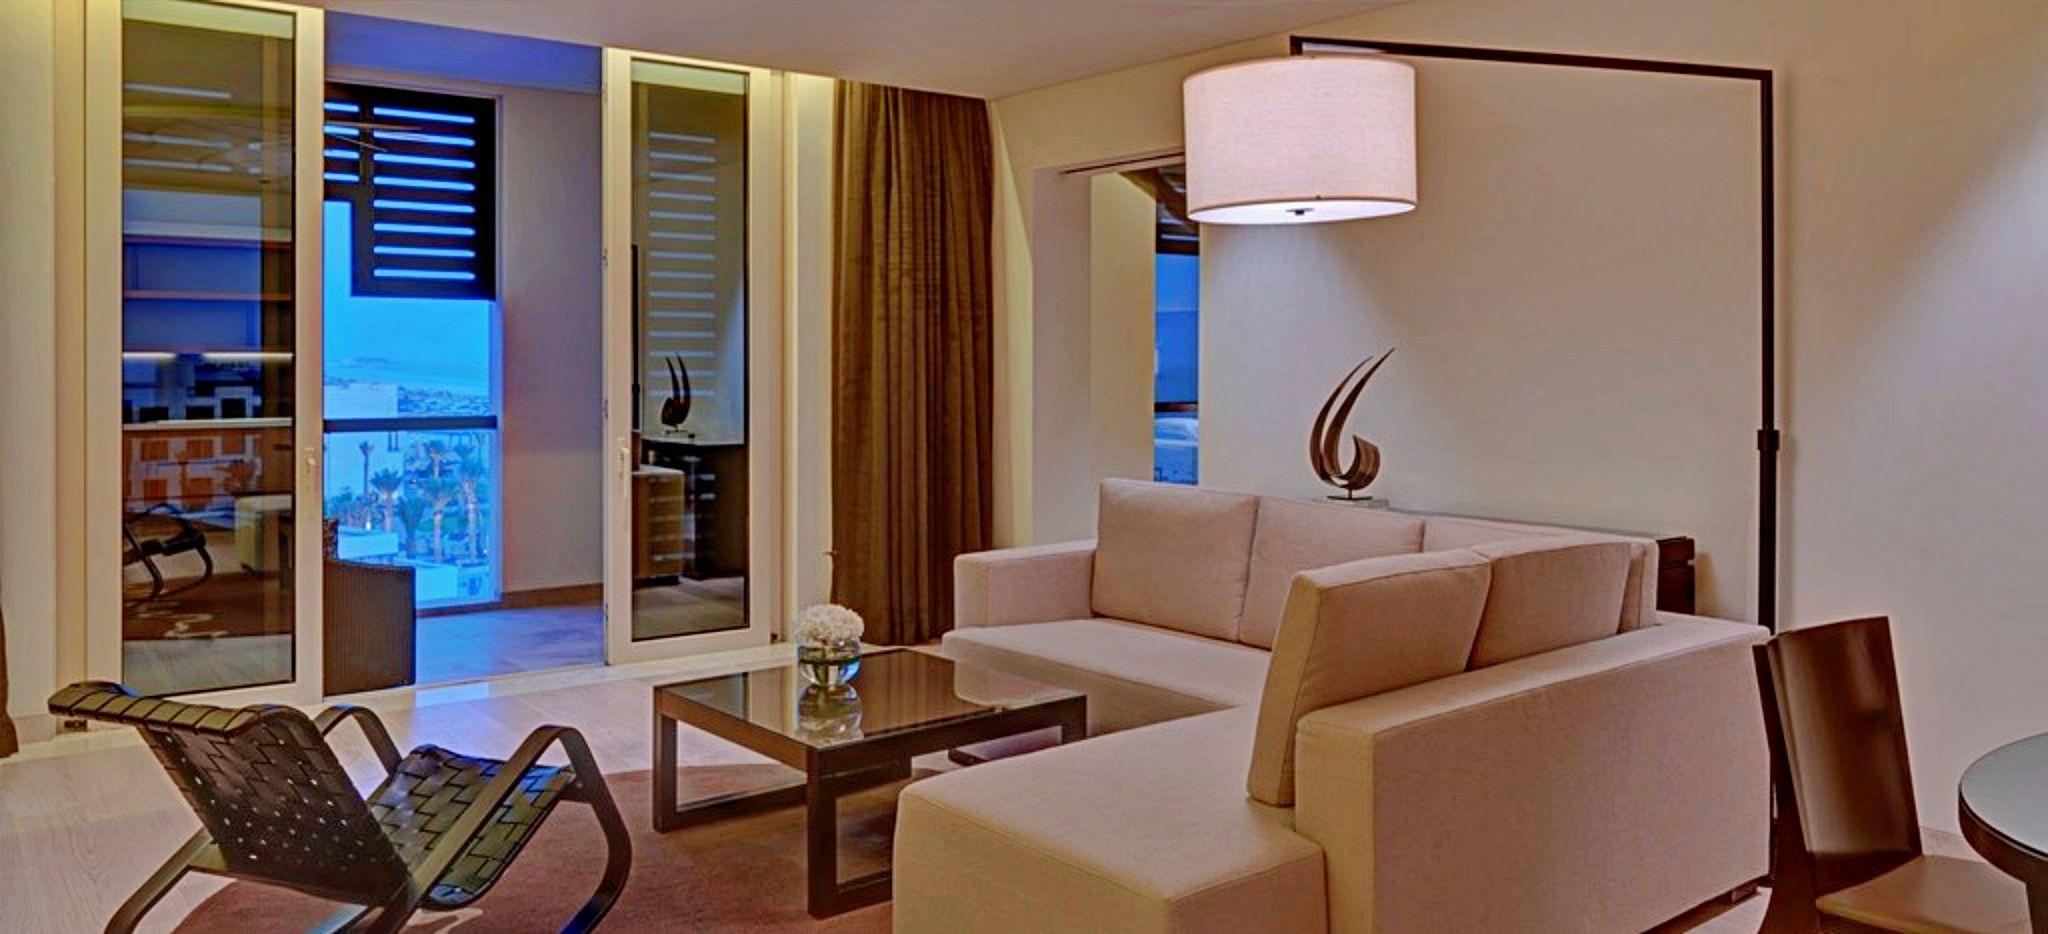 Lounge der Executive Suite im Hotel Pakr Hyatt Abu Dhabi